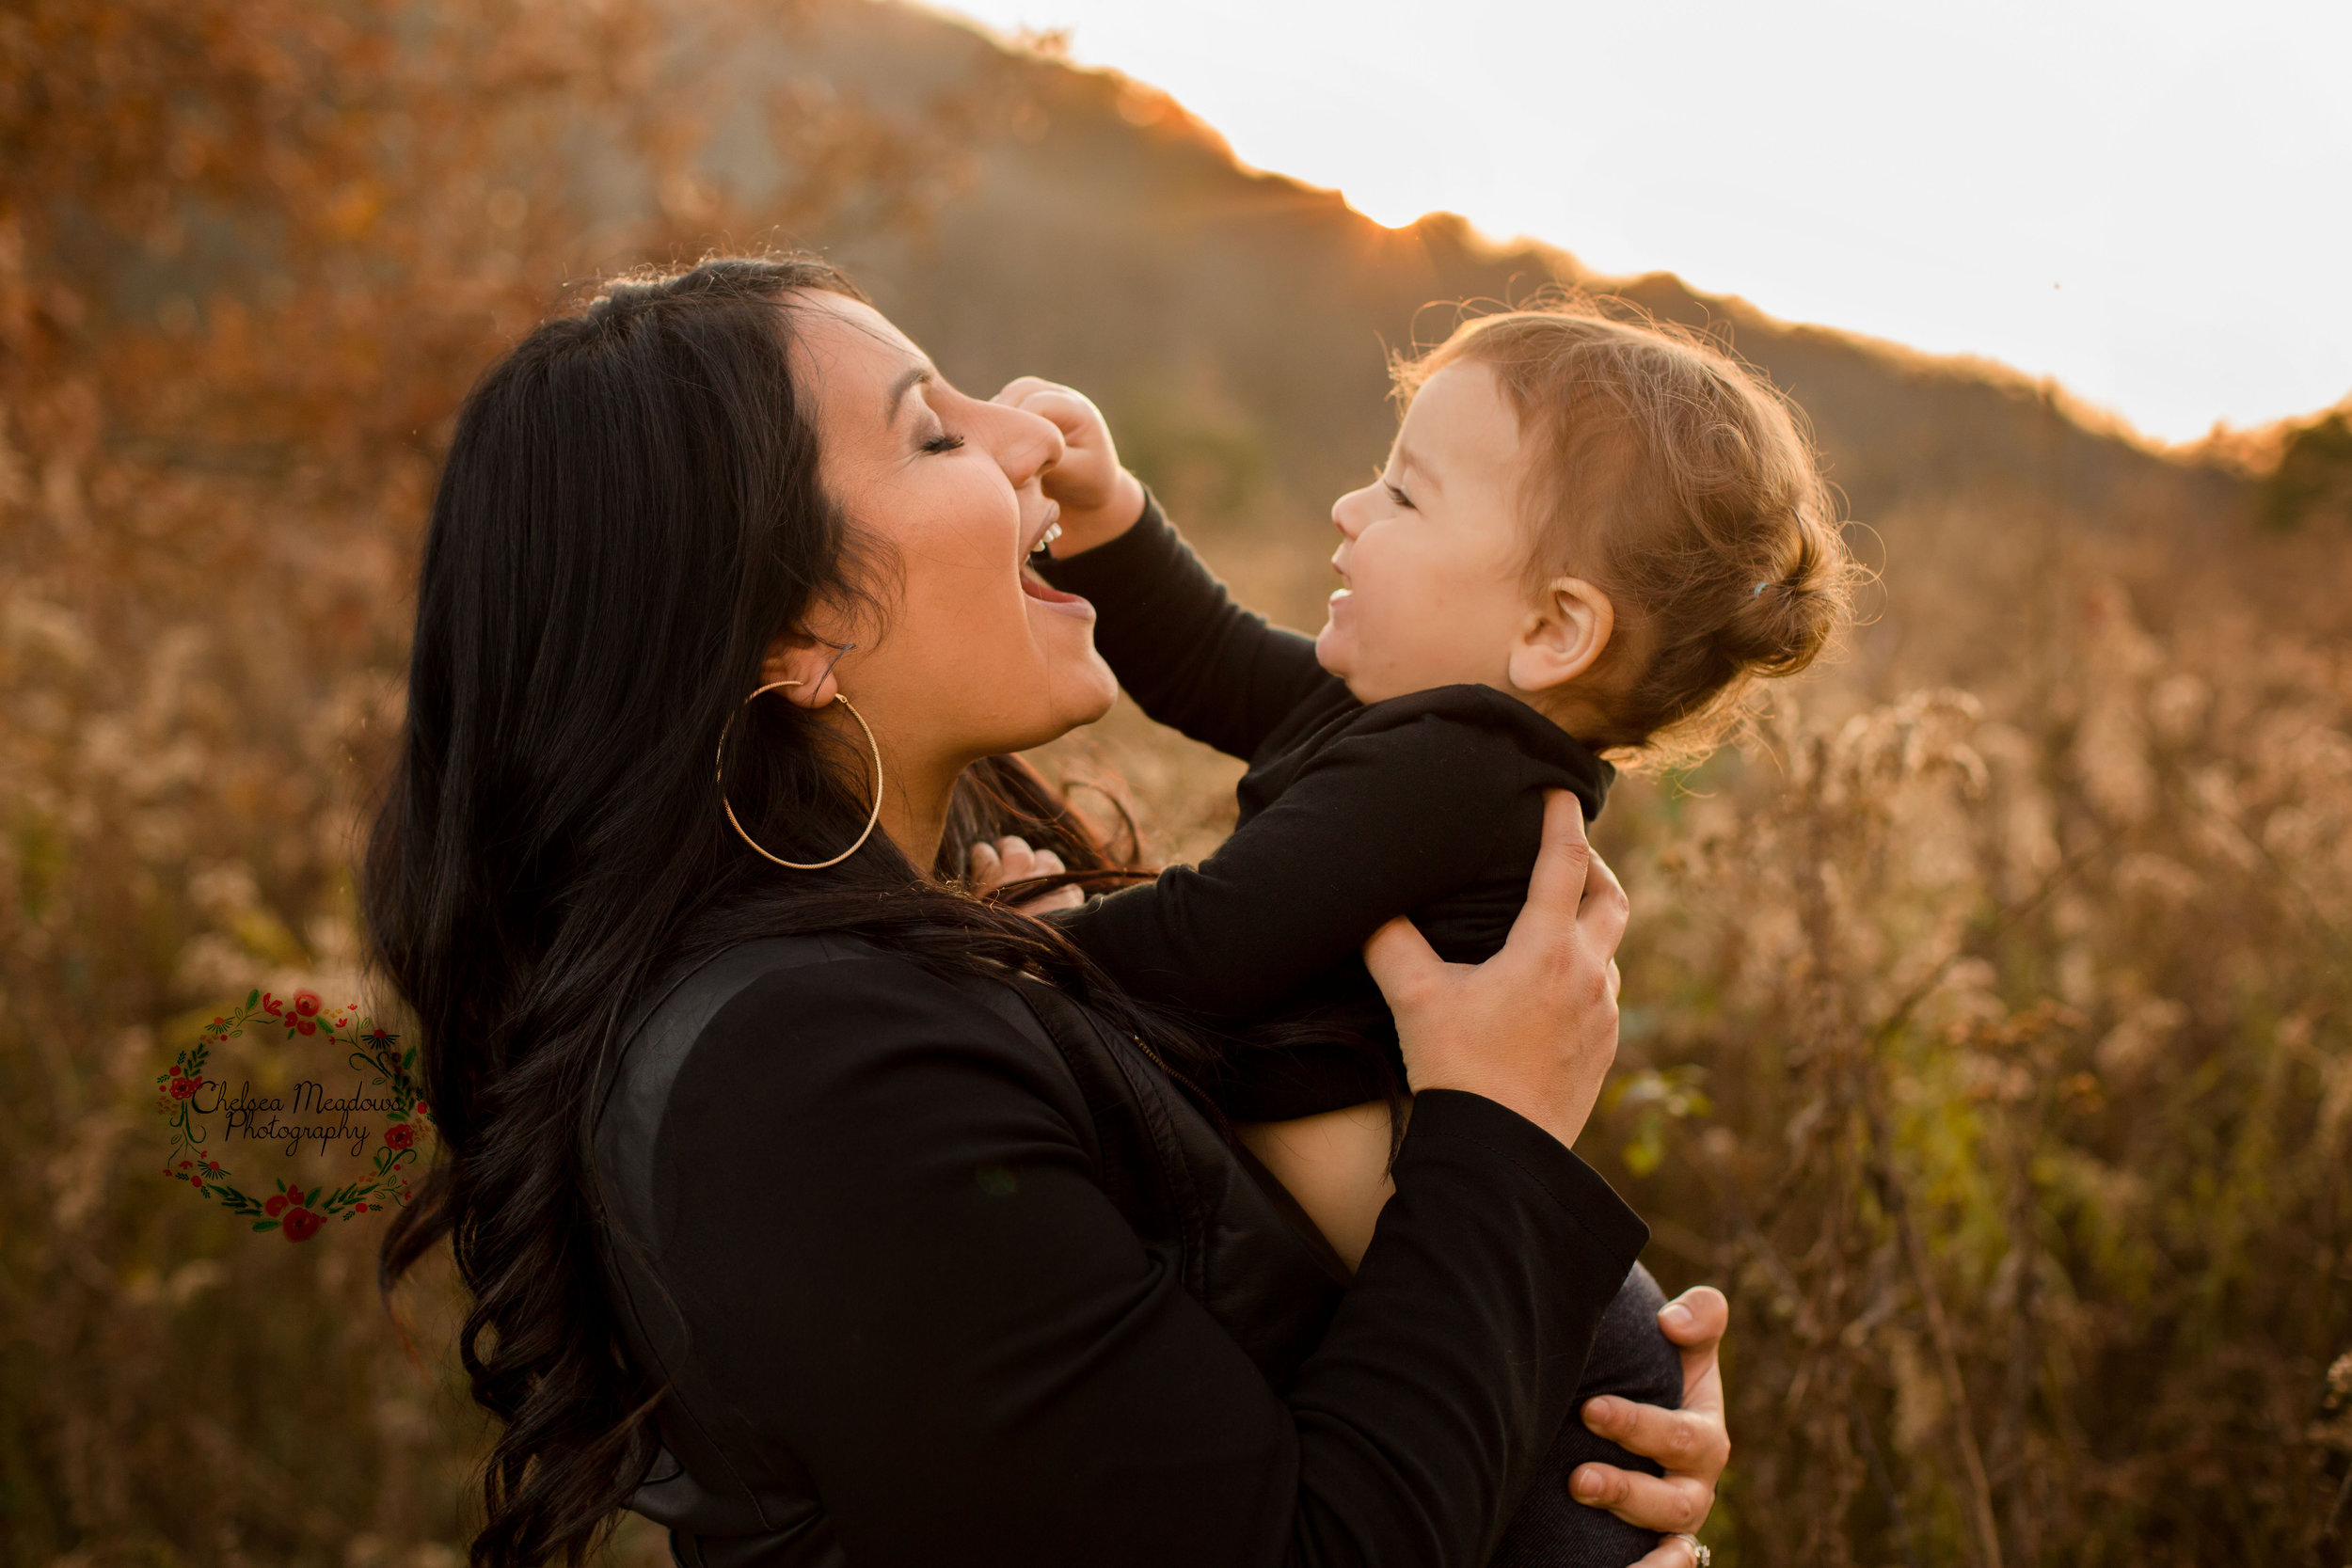 Smith Family Christmas Photos - Nashville Family Photographer - Chelsea Meadows Photography (73).jpg